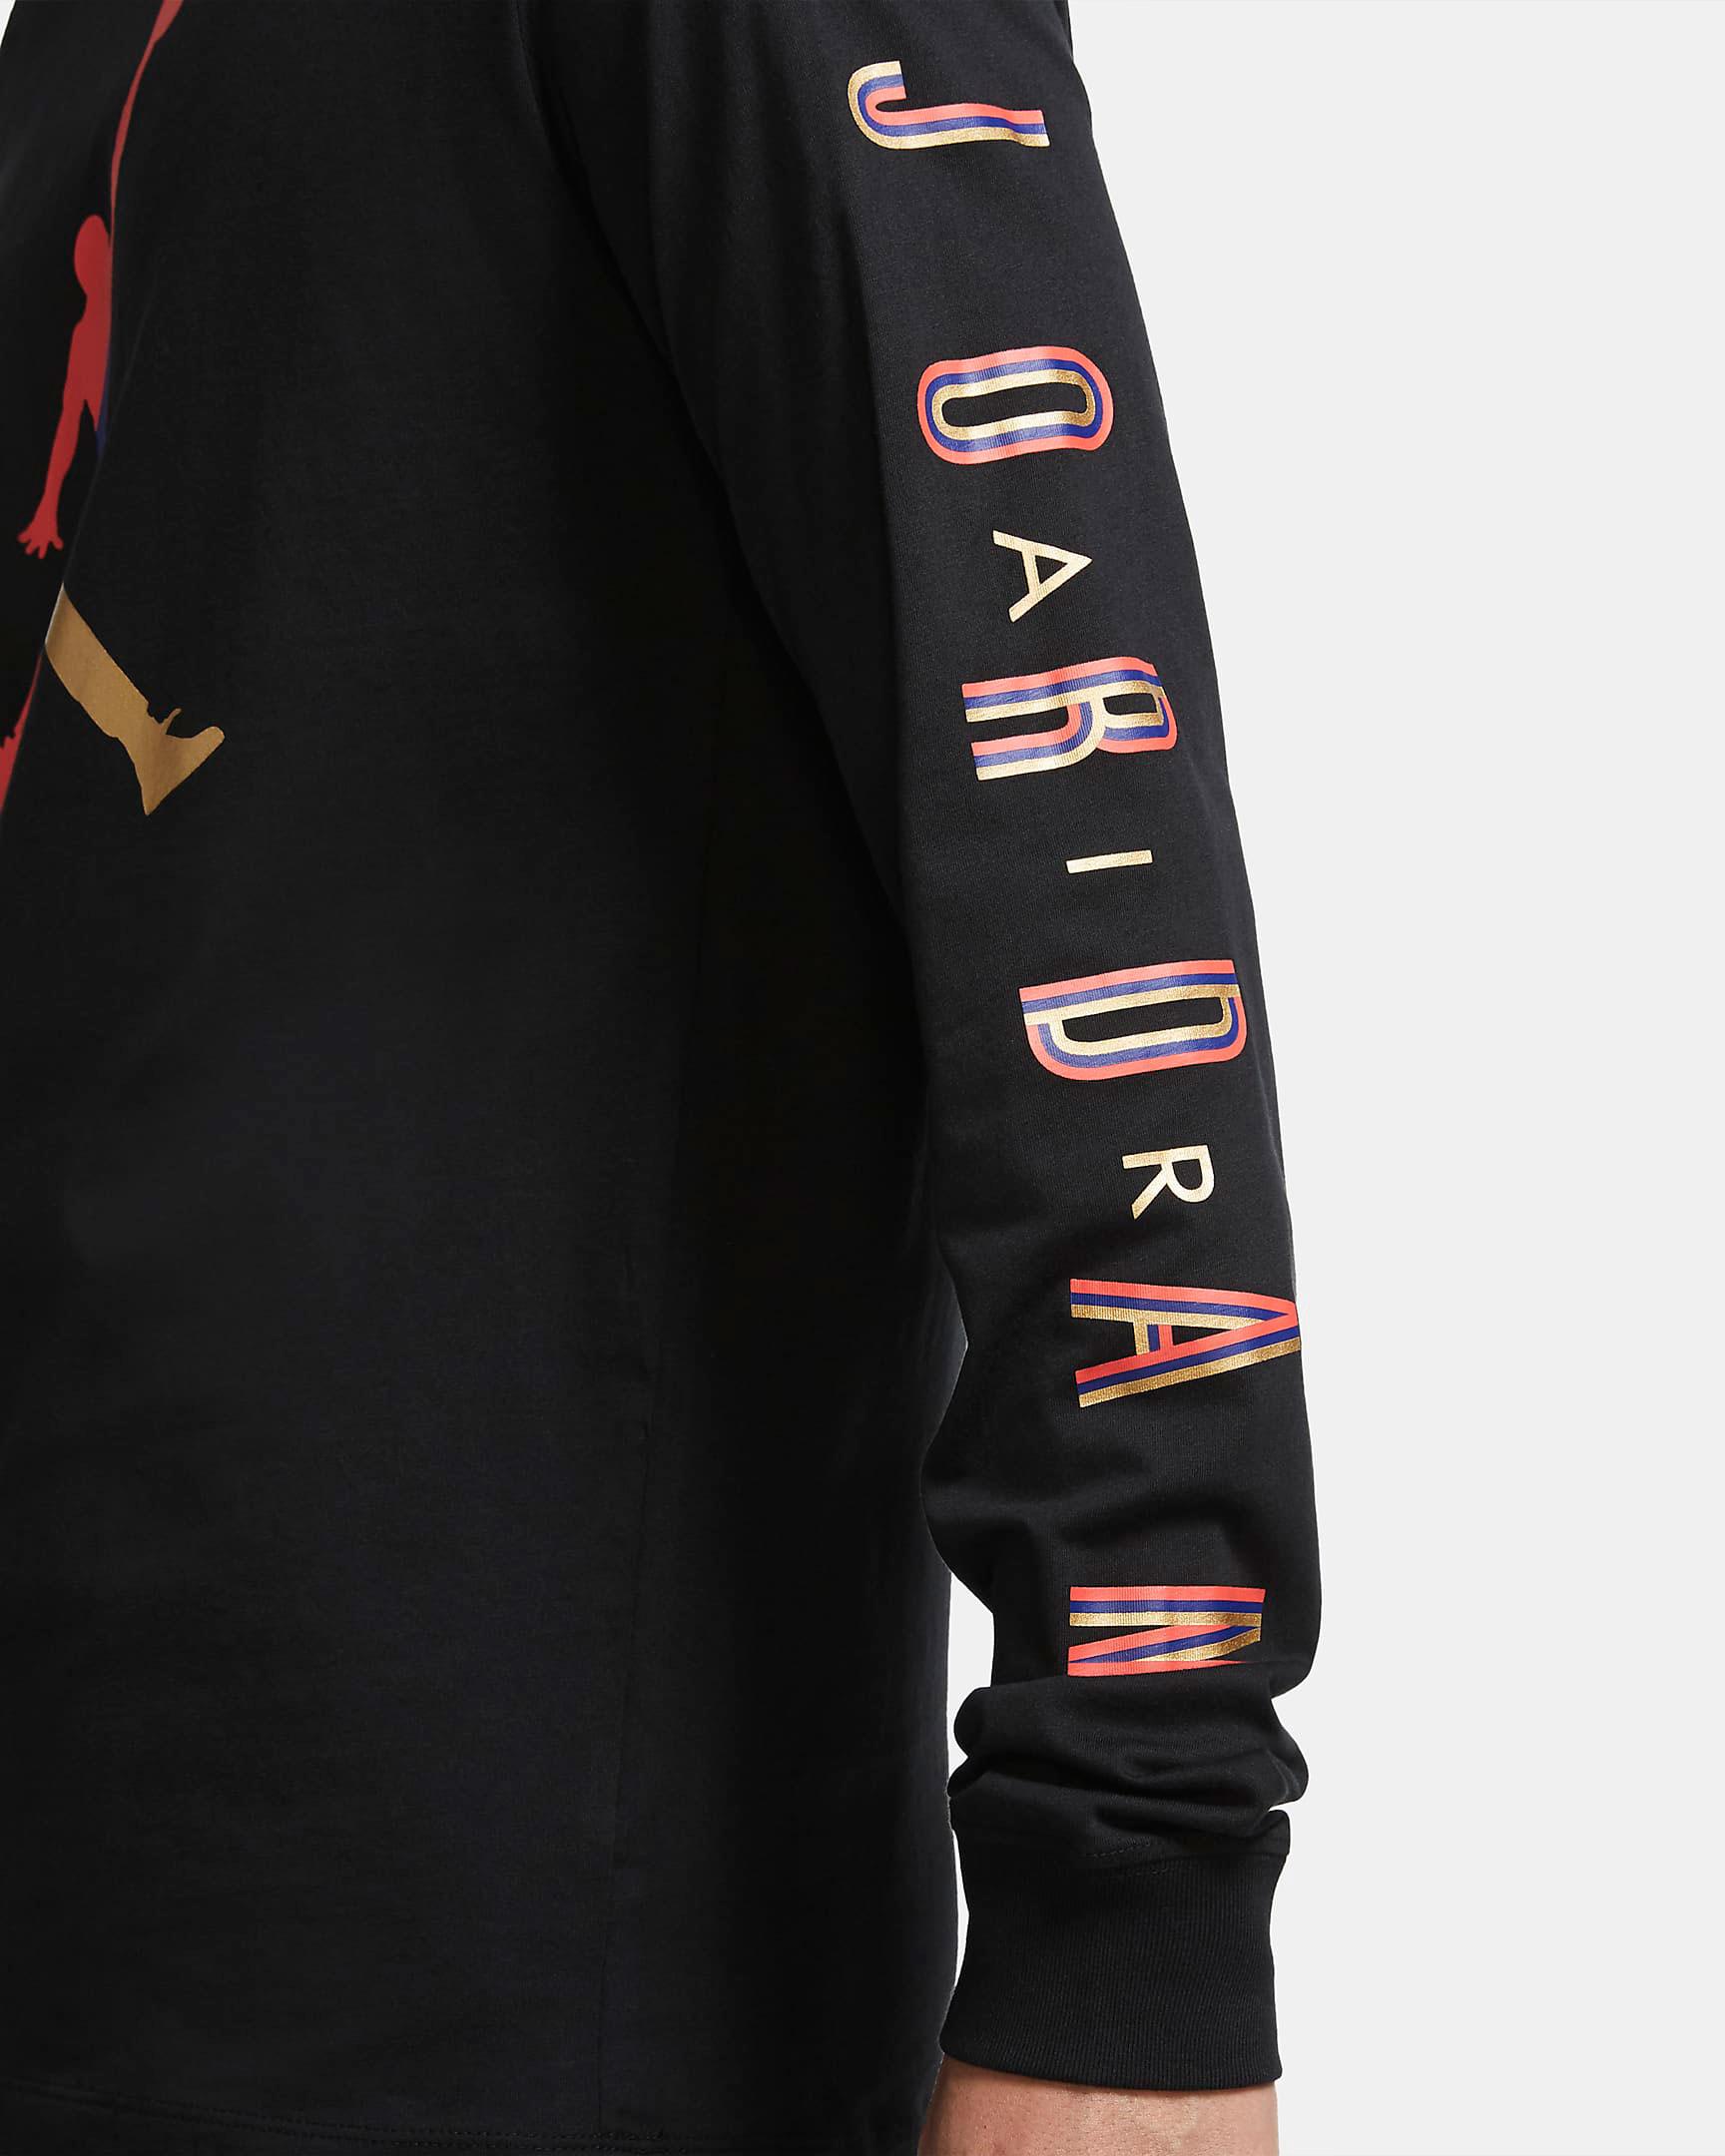 air-jordan-1-low-sweater-nothing-but-net-shirt-3